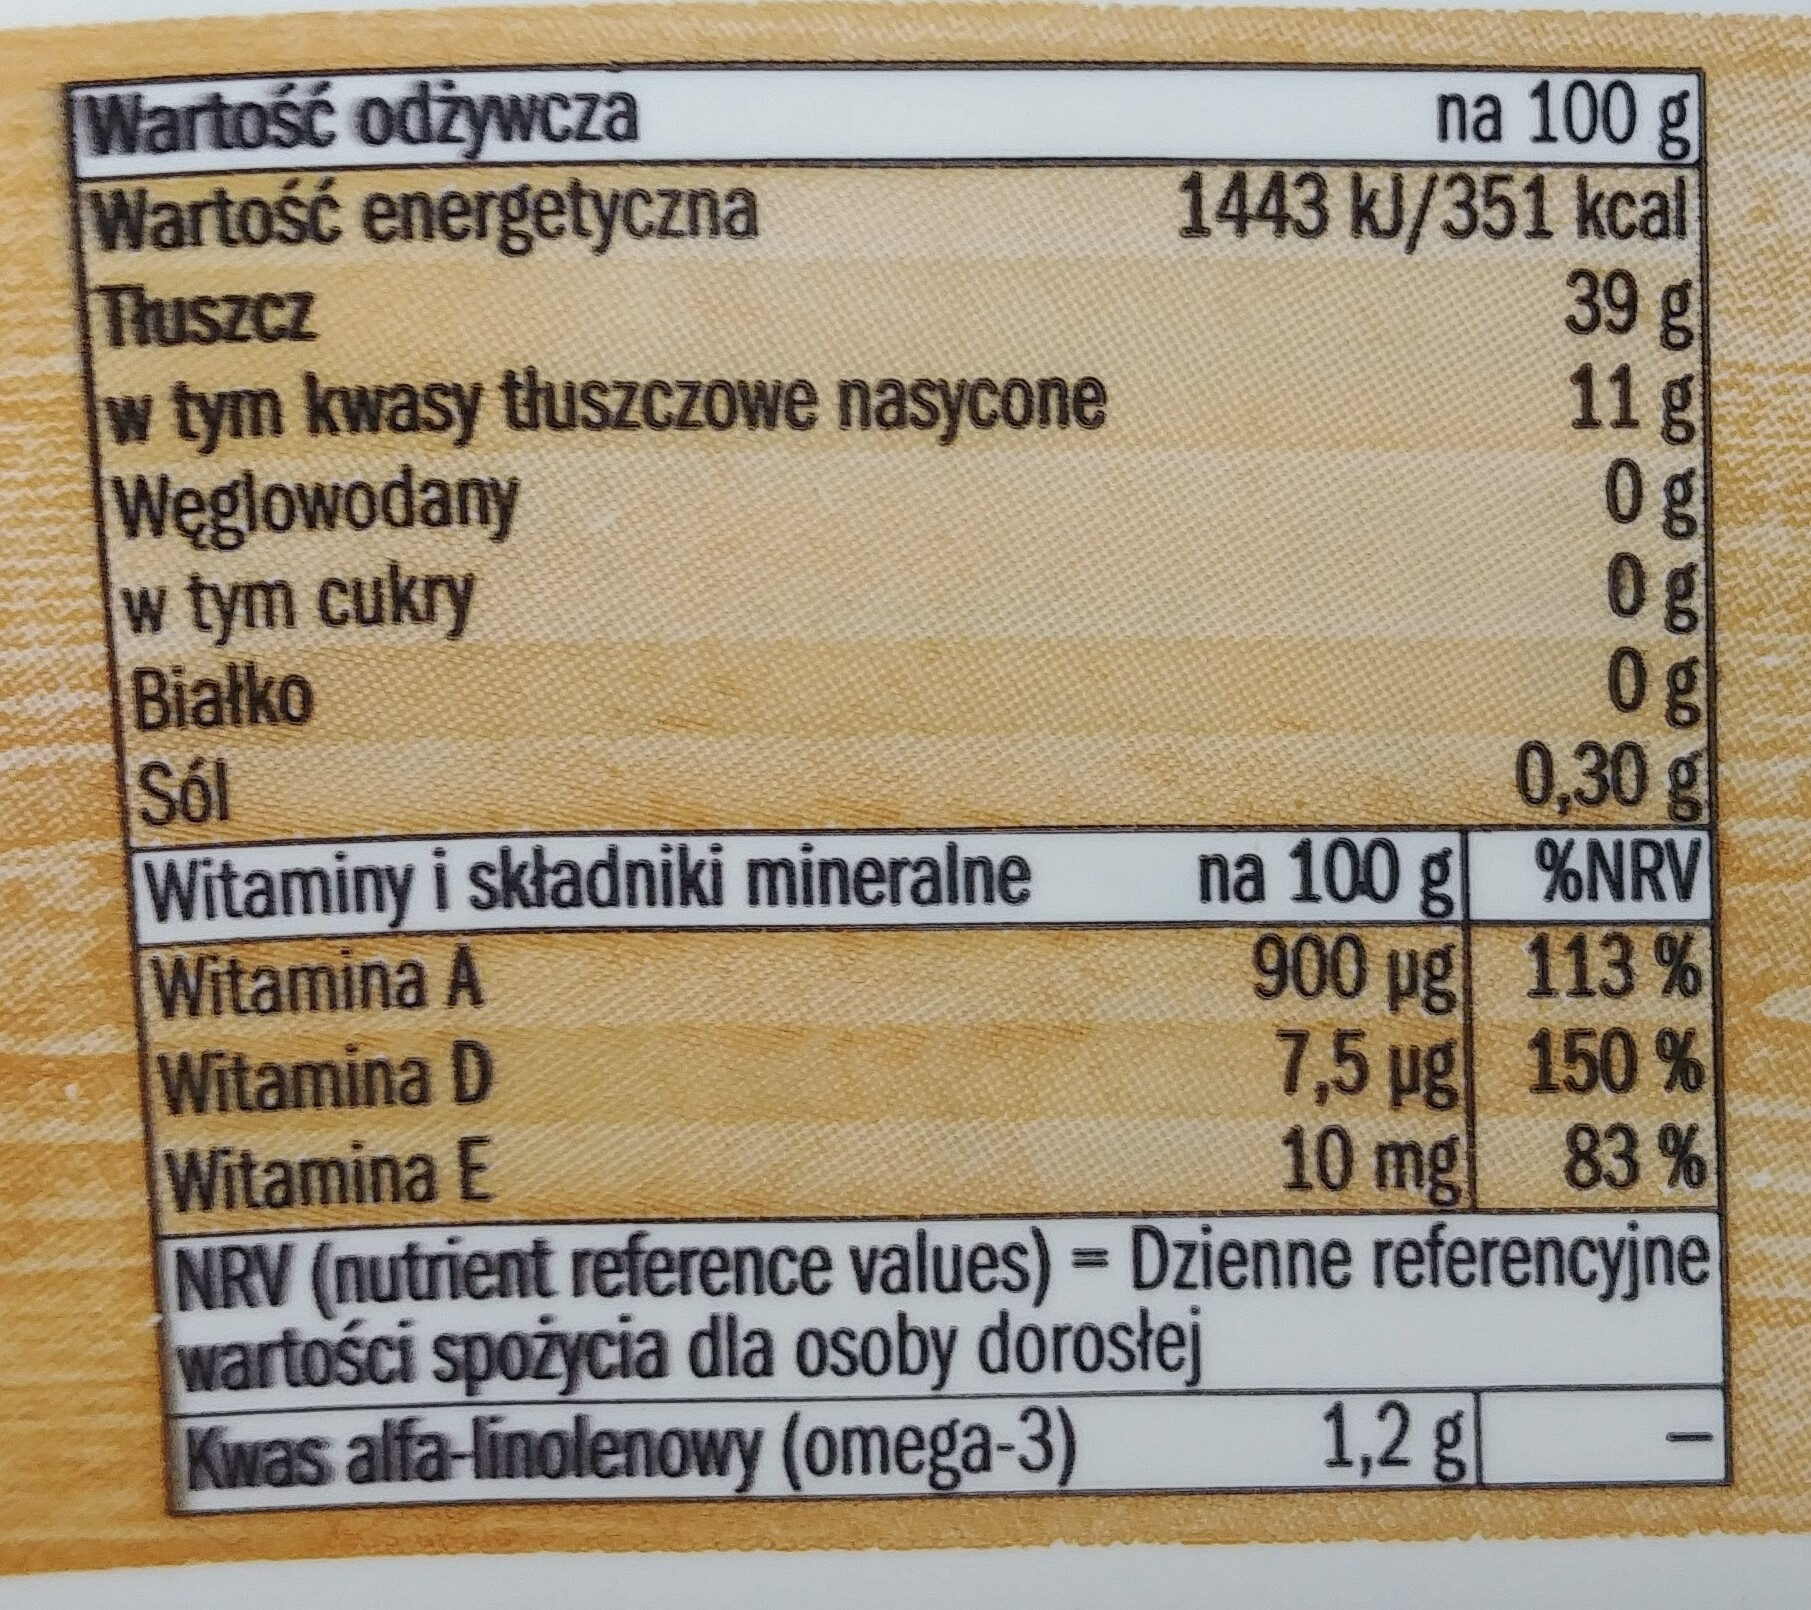 Margaryna lekka 39 %. - Nutrition facts